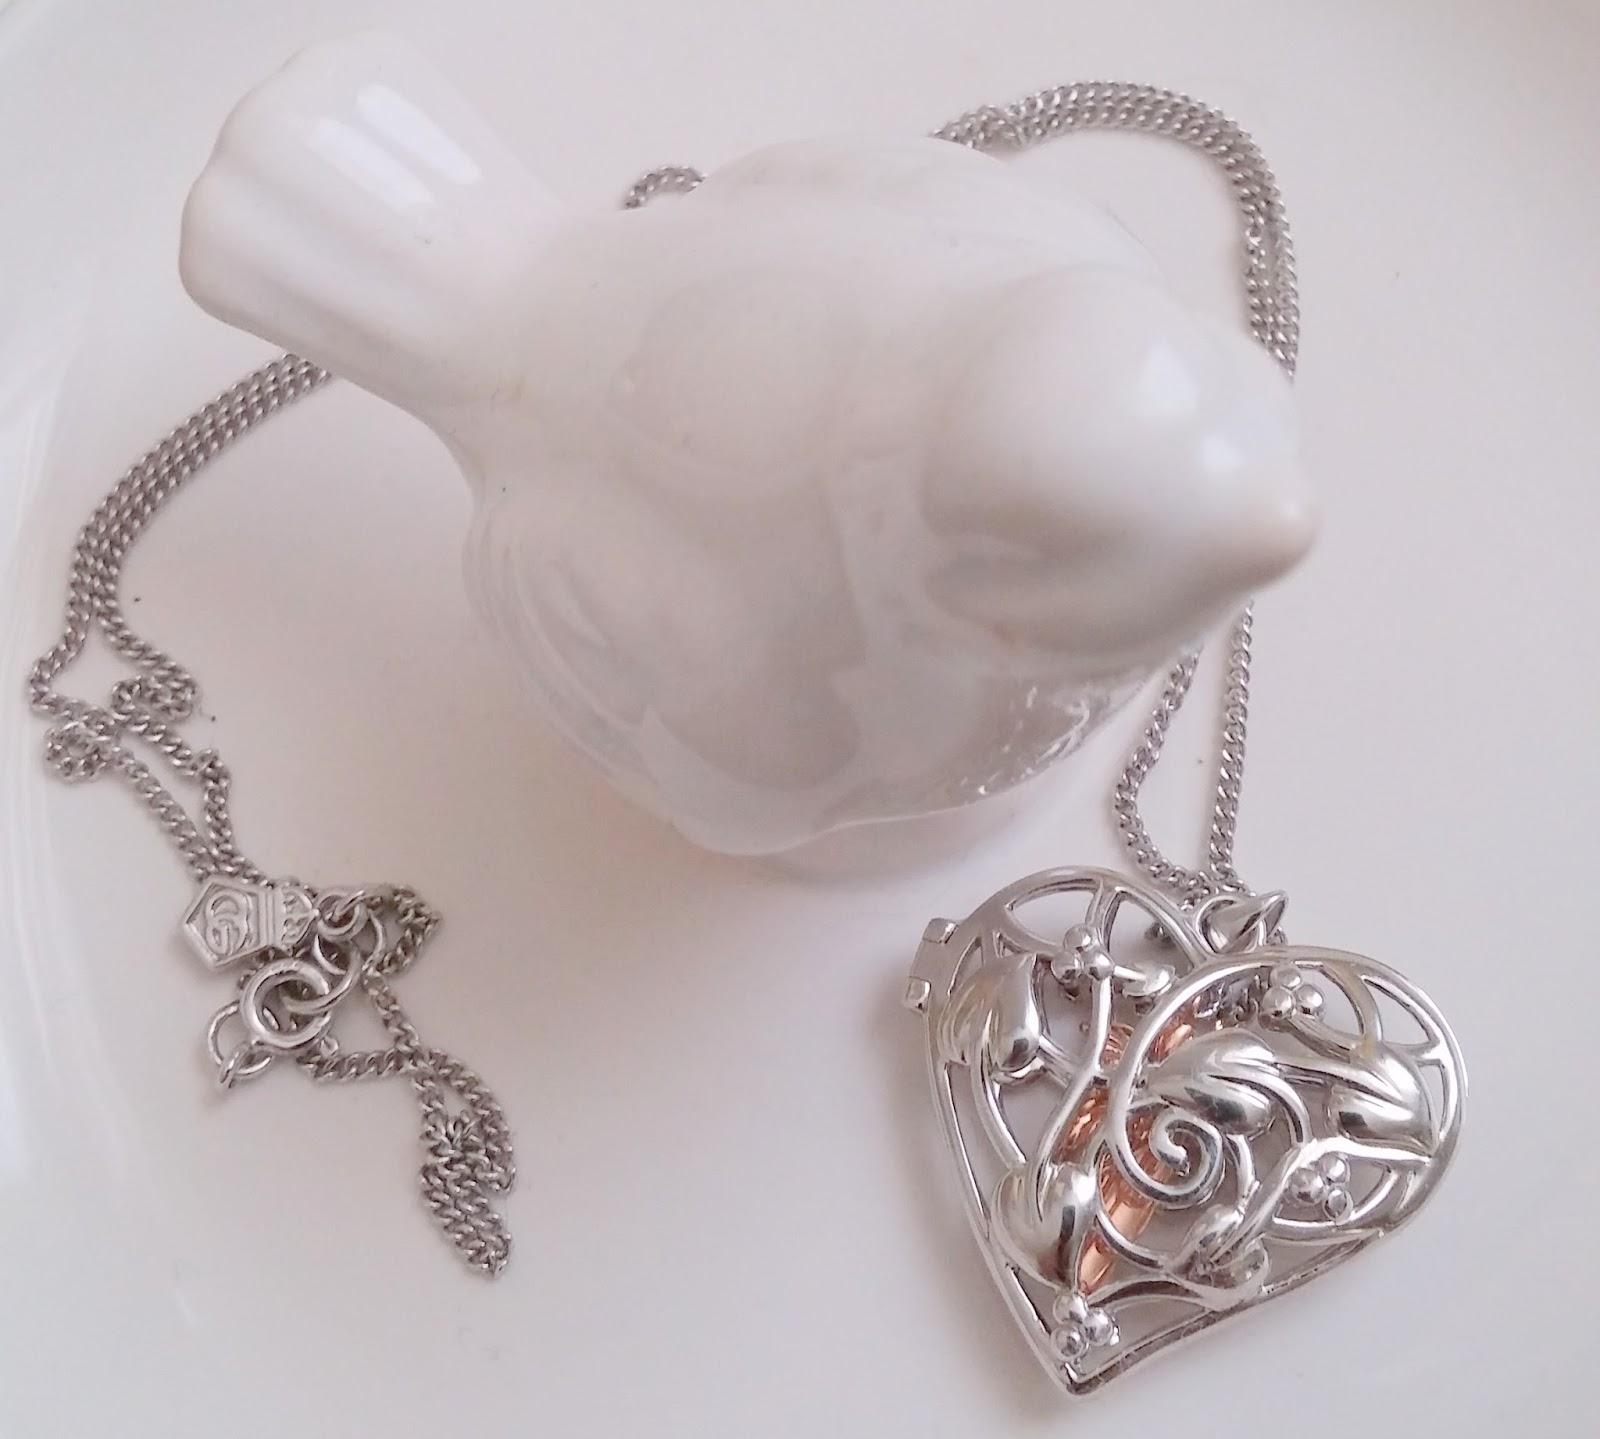 Clogau Gold Fairy Necklace on Bird dish